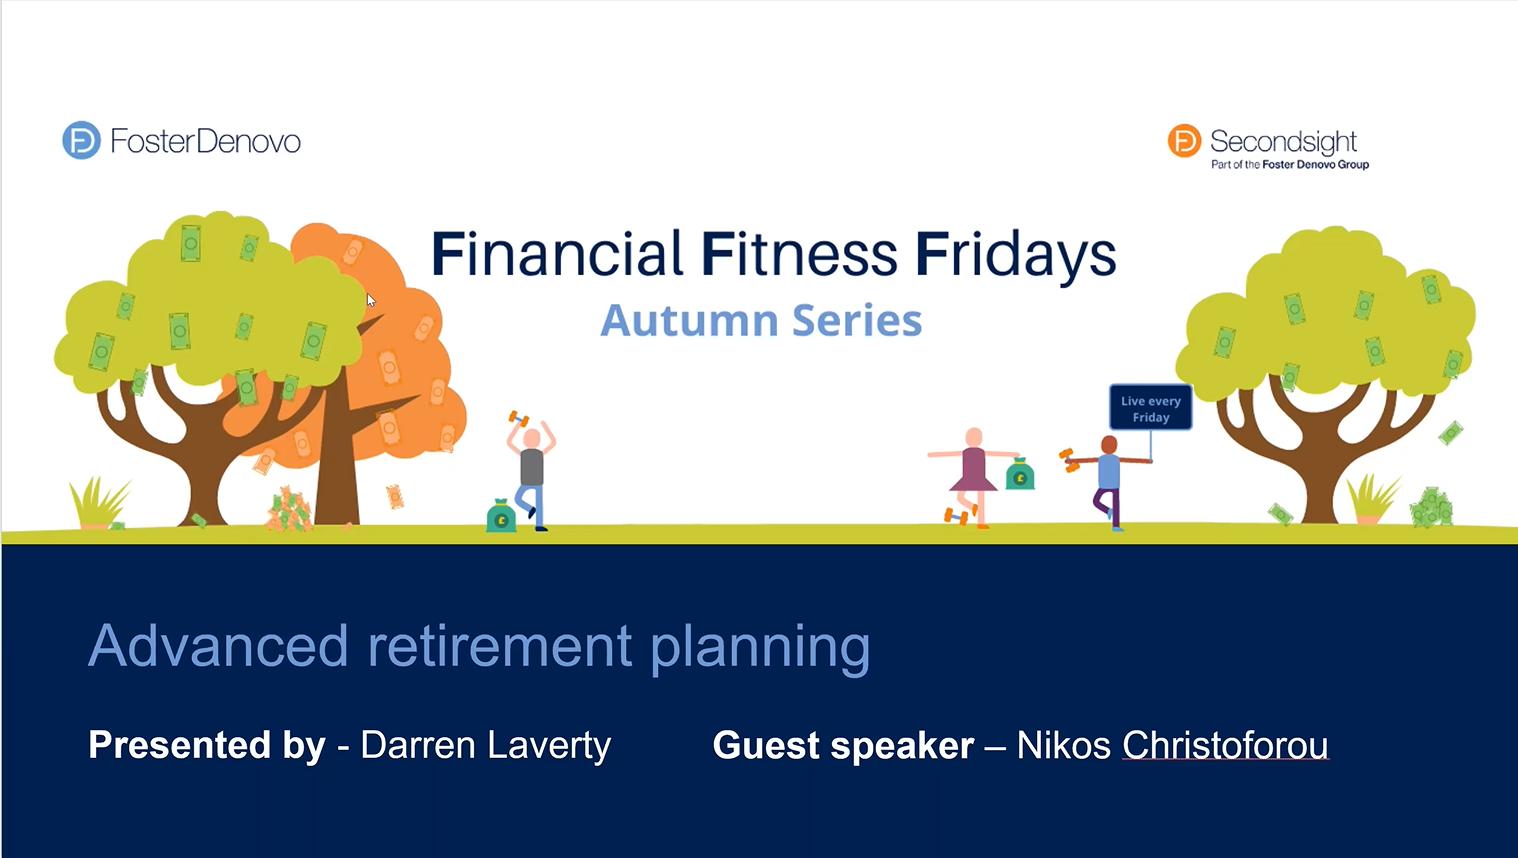 Financial Fitness Fridays Autumn Series Week 1